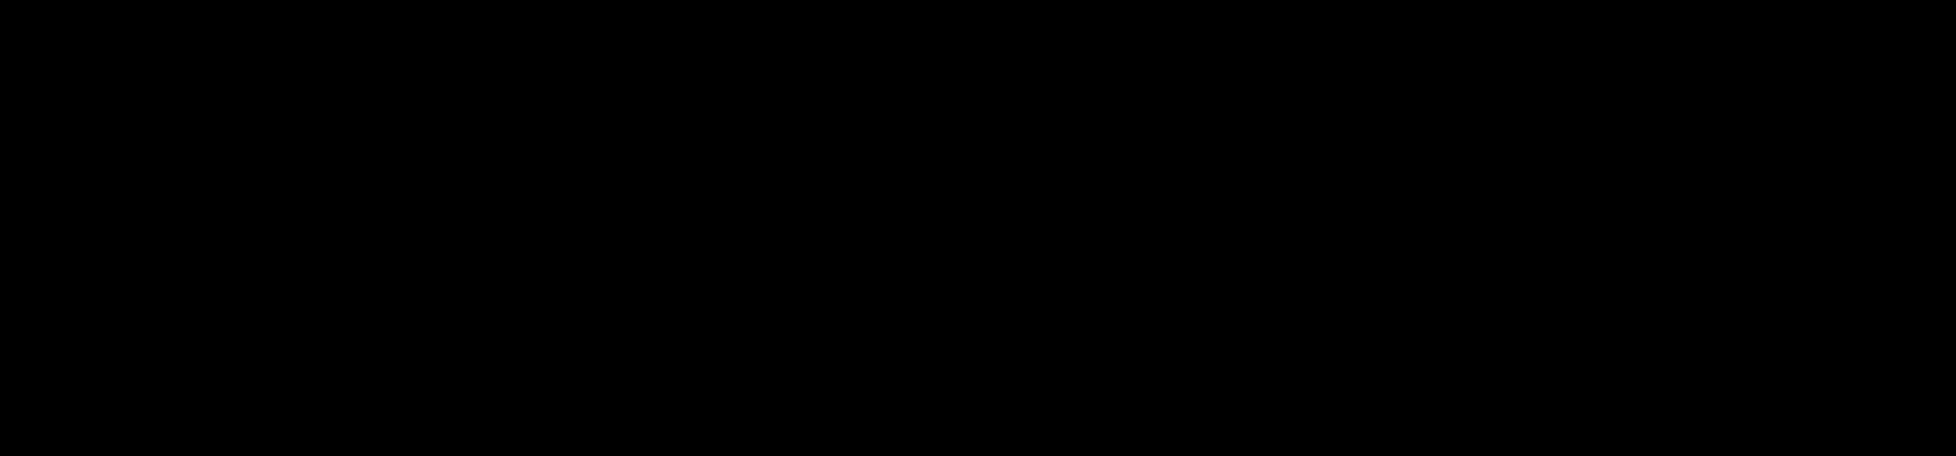 Torchbox logo